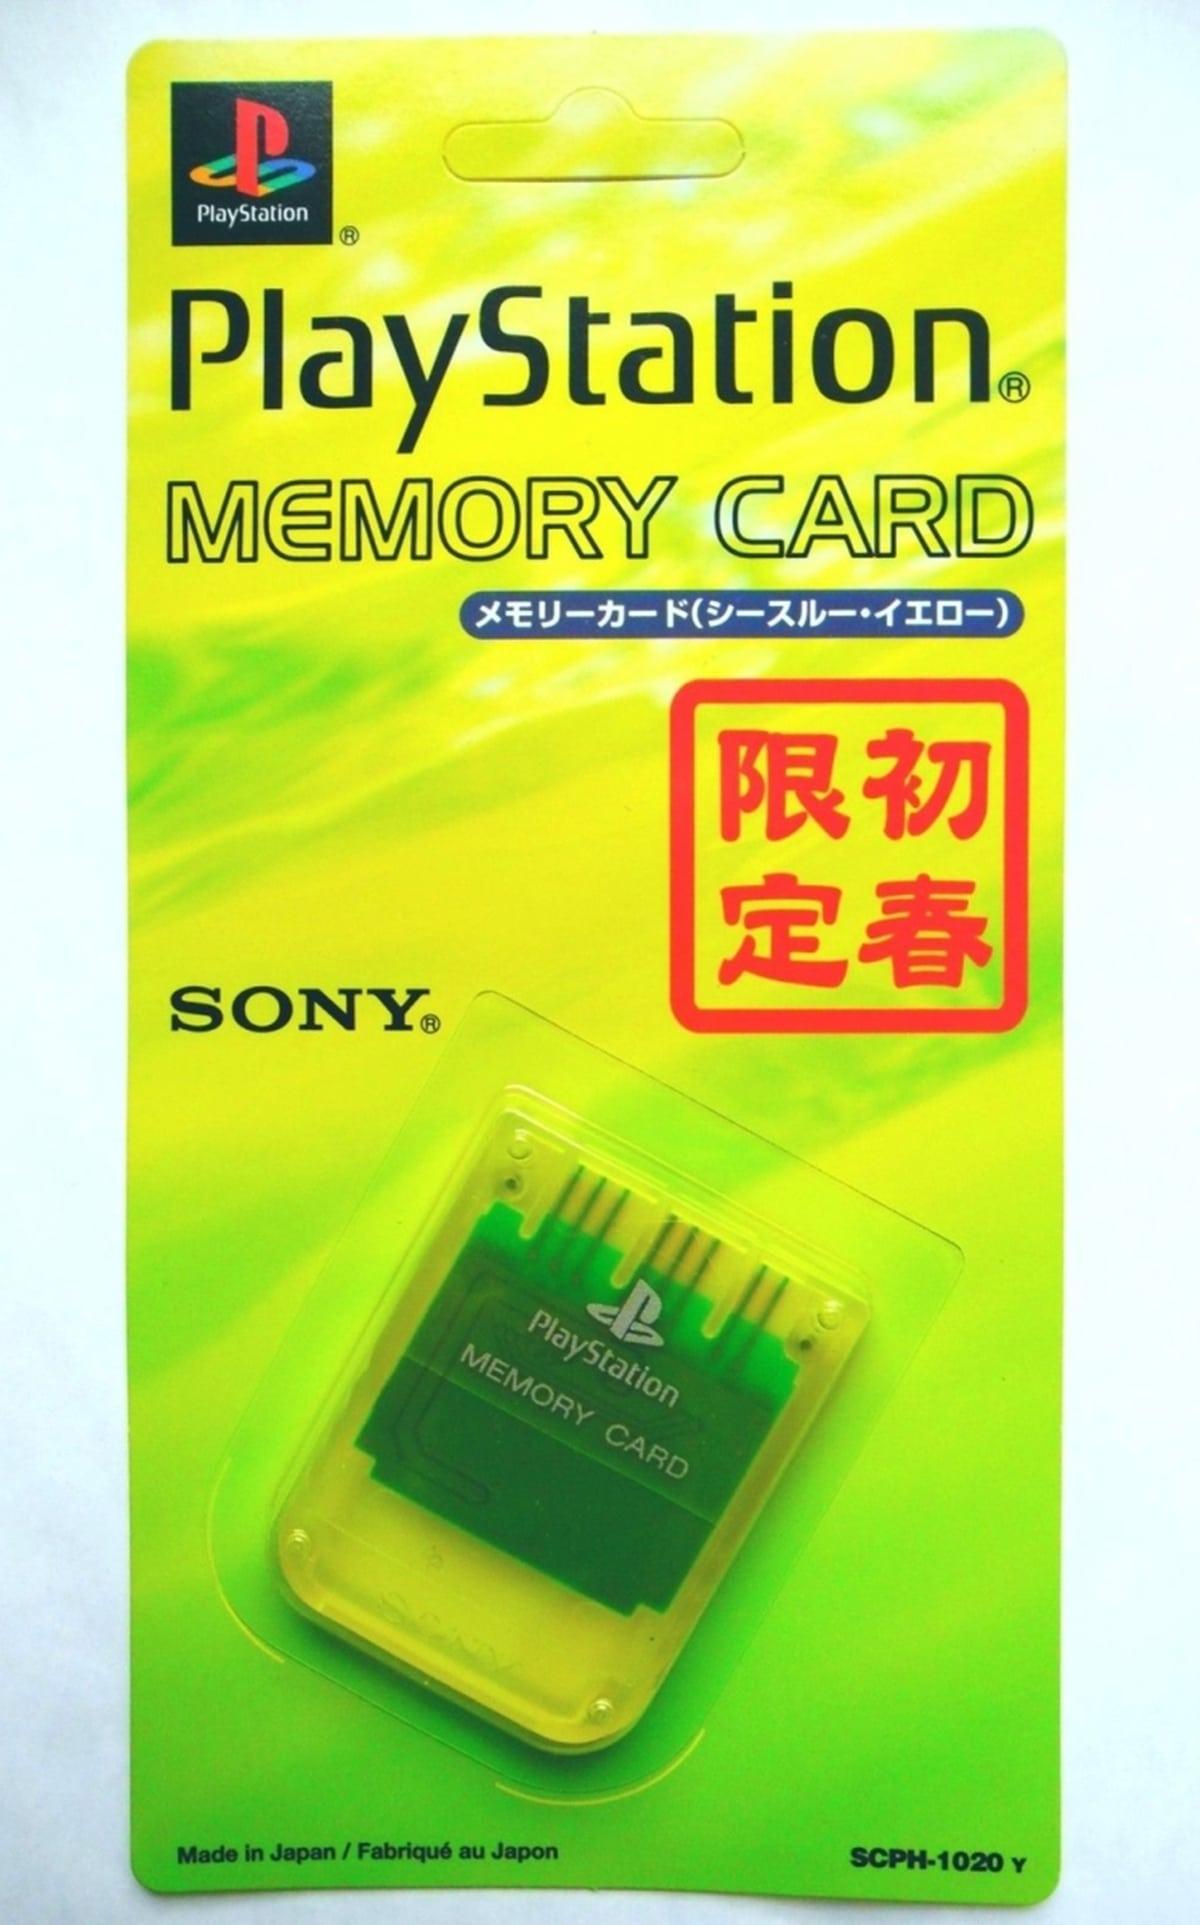 memory card scph 1020y 021 - [SCPH-1020] Memory Card / Karta pamięci